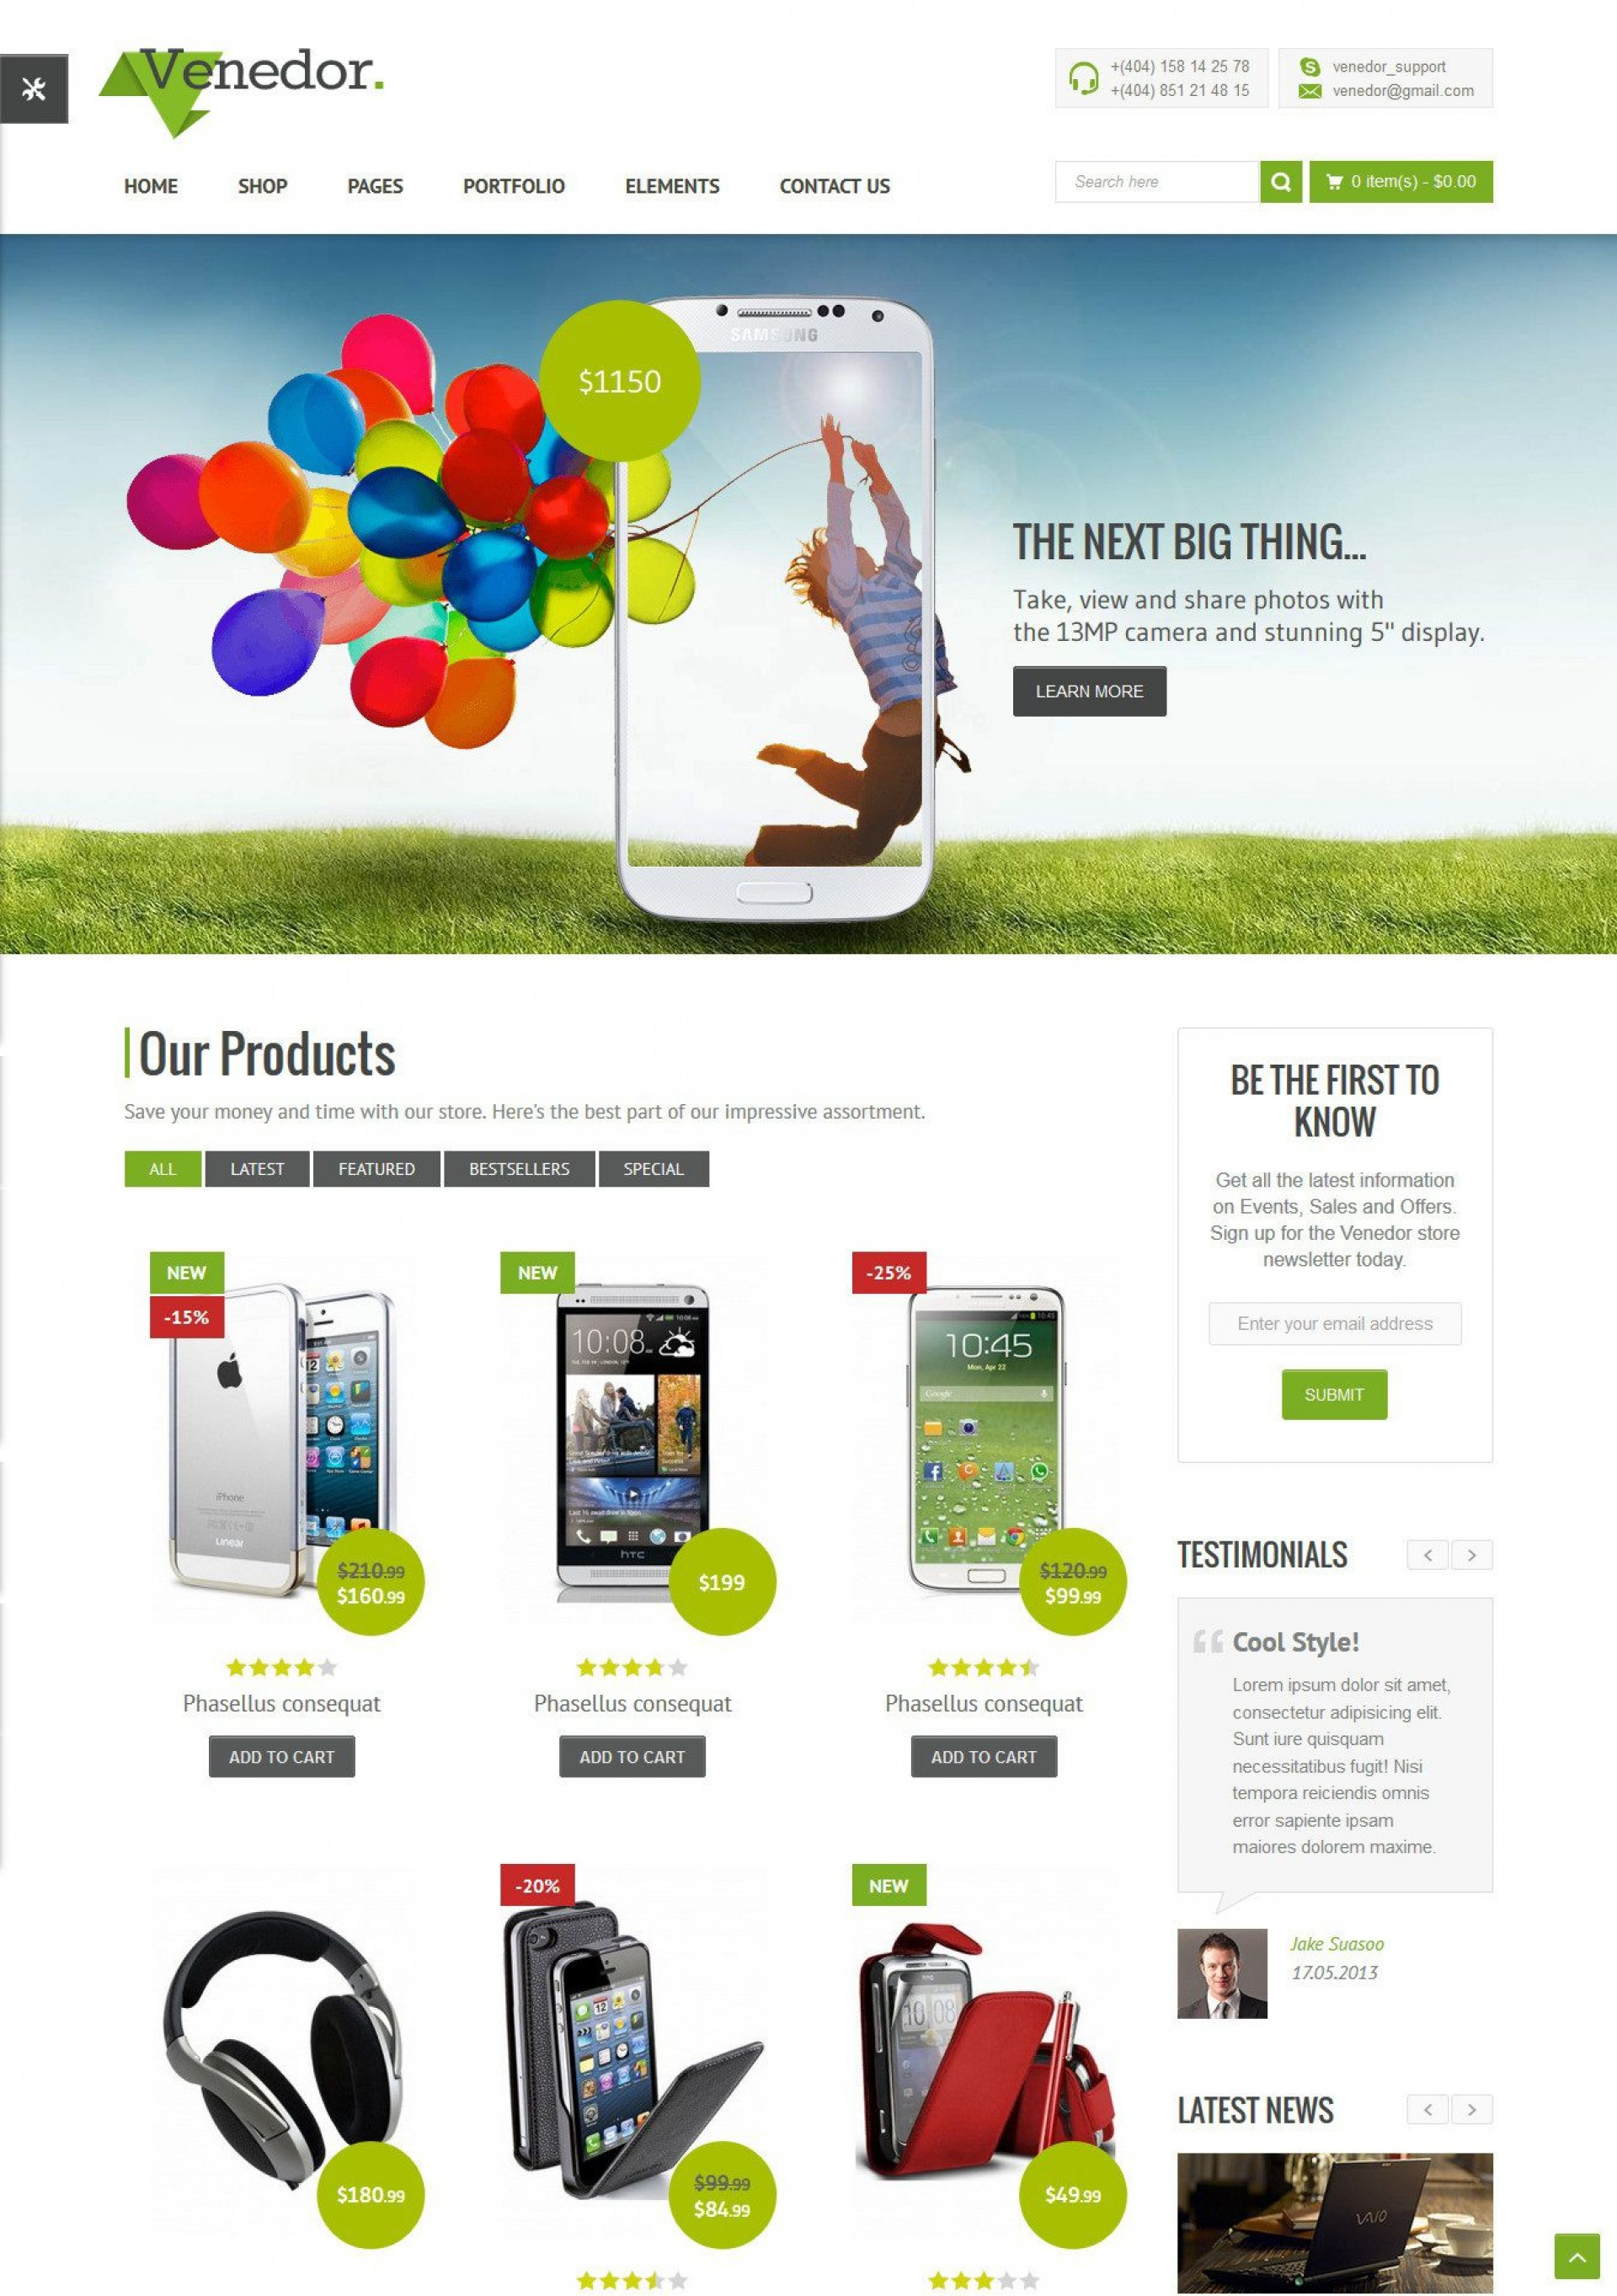 009 Breathtaking Free Ecommerce Website Template Idea  Templates Github For Blogger Shopping Cart Wordpres1920